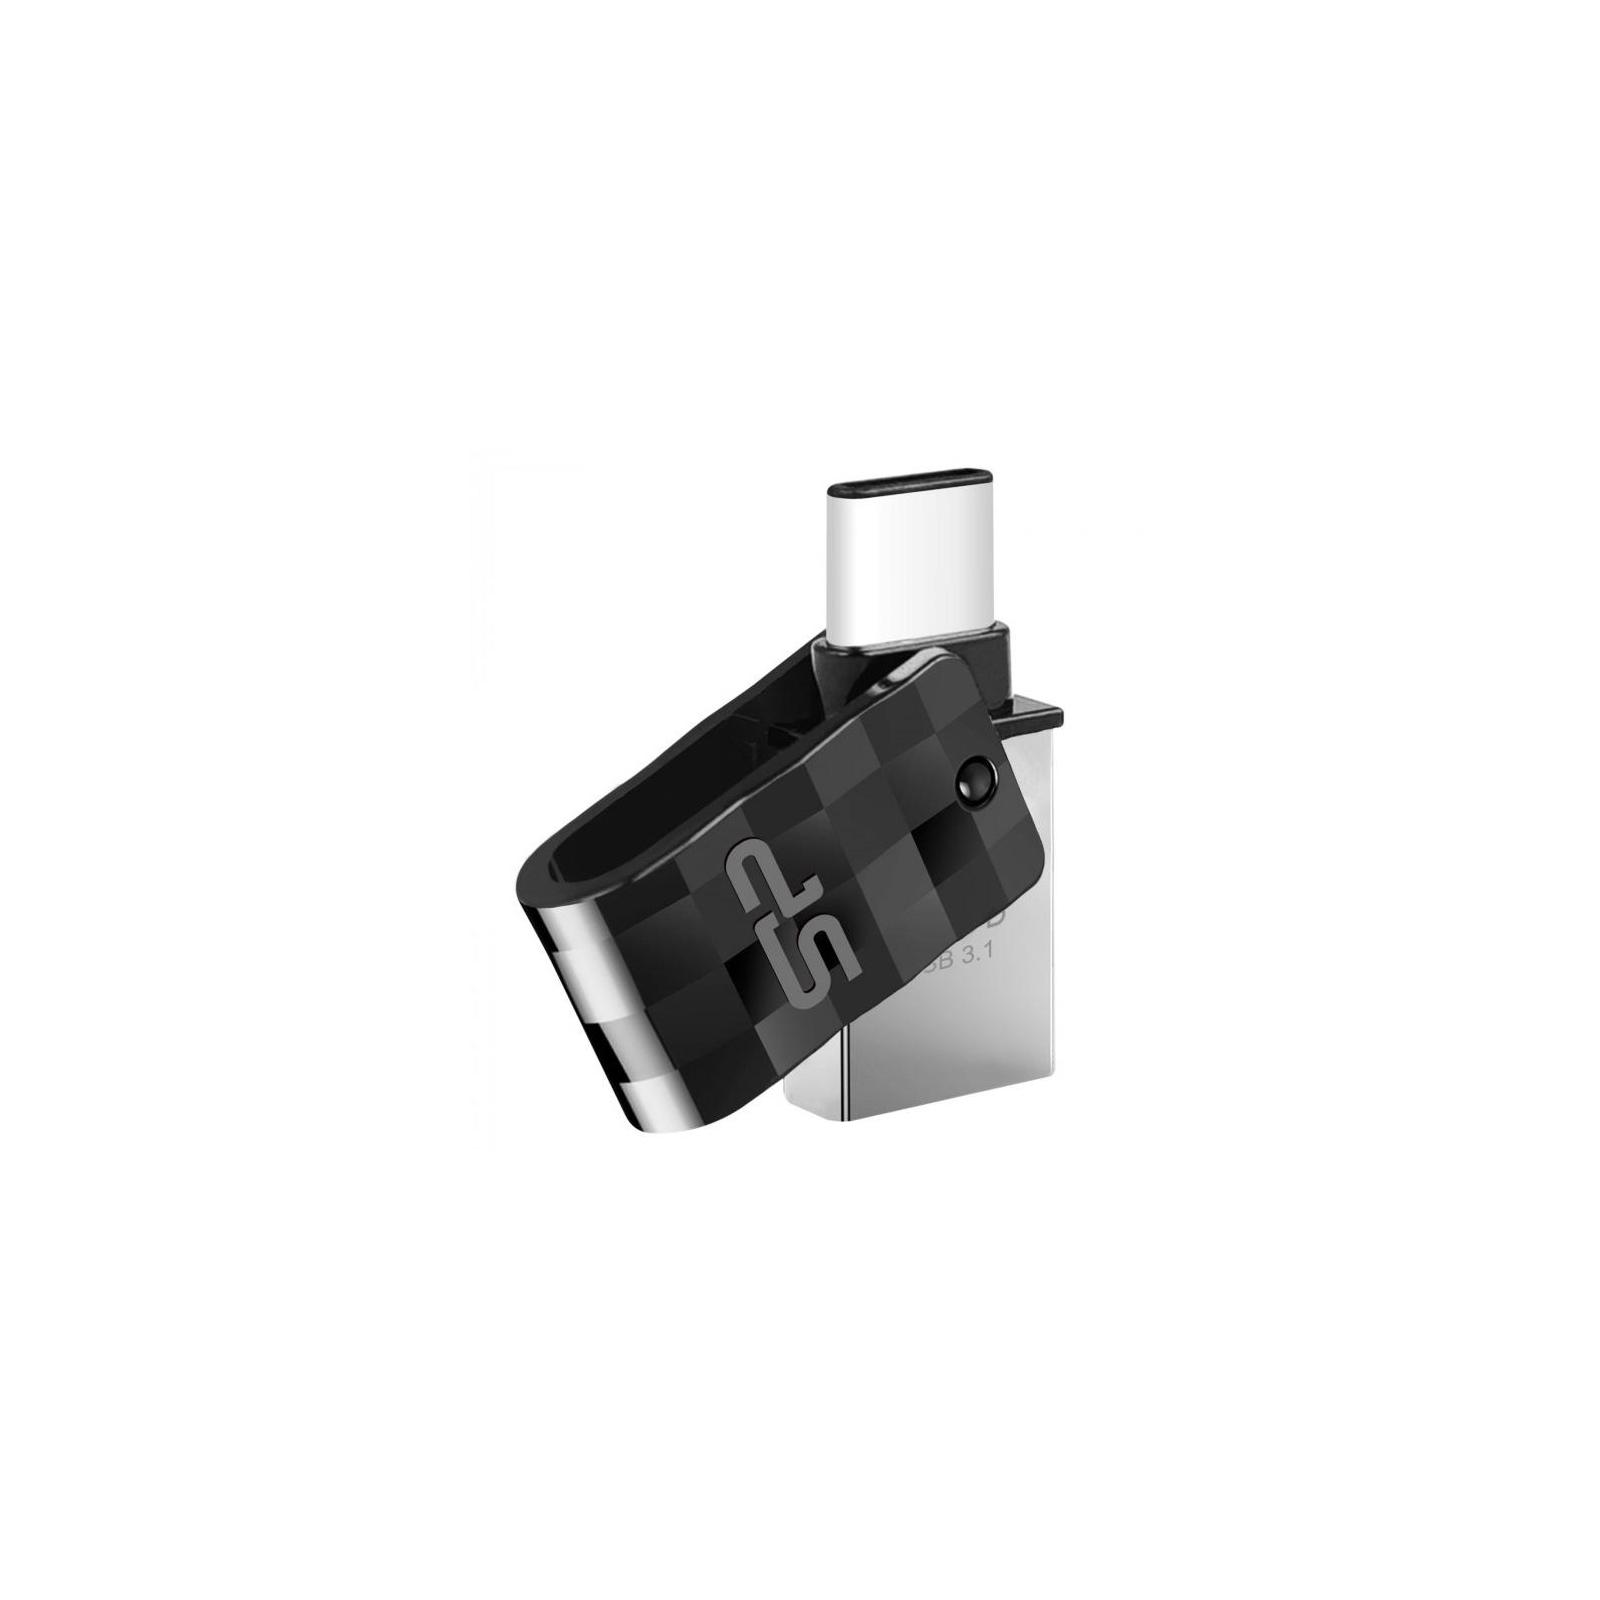 USB флеш накопитель Silicon Power 64GB Mobile C31 USB 3.1 / USB Type-C (SP064GBUC3C31V1K) изображение 2